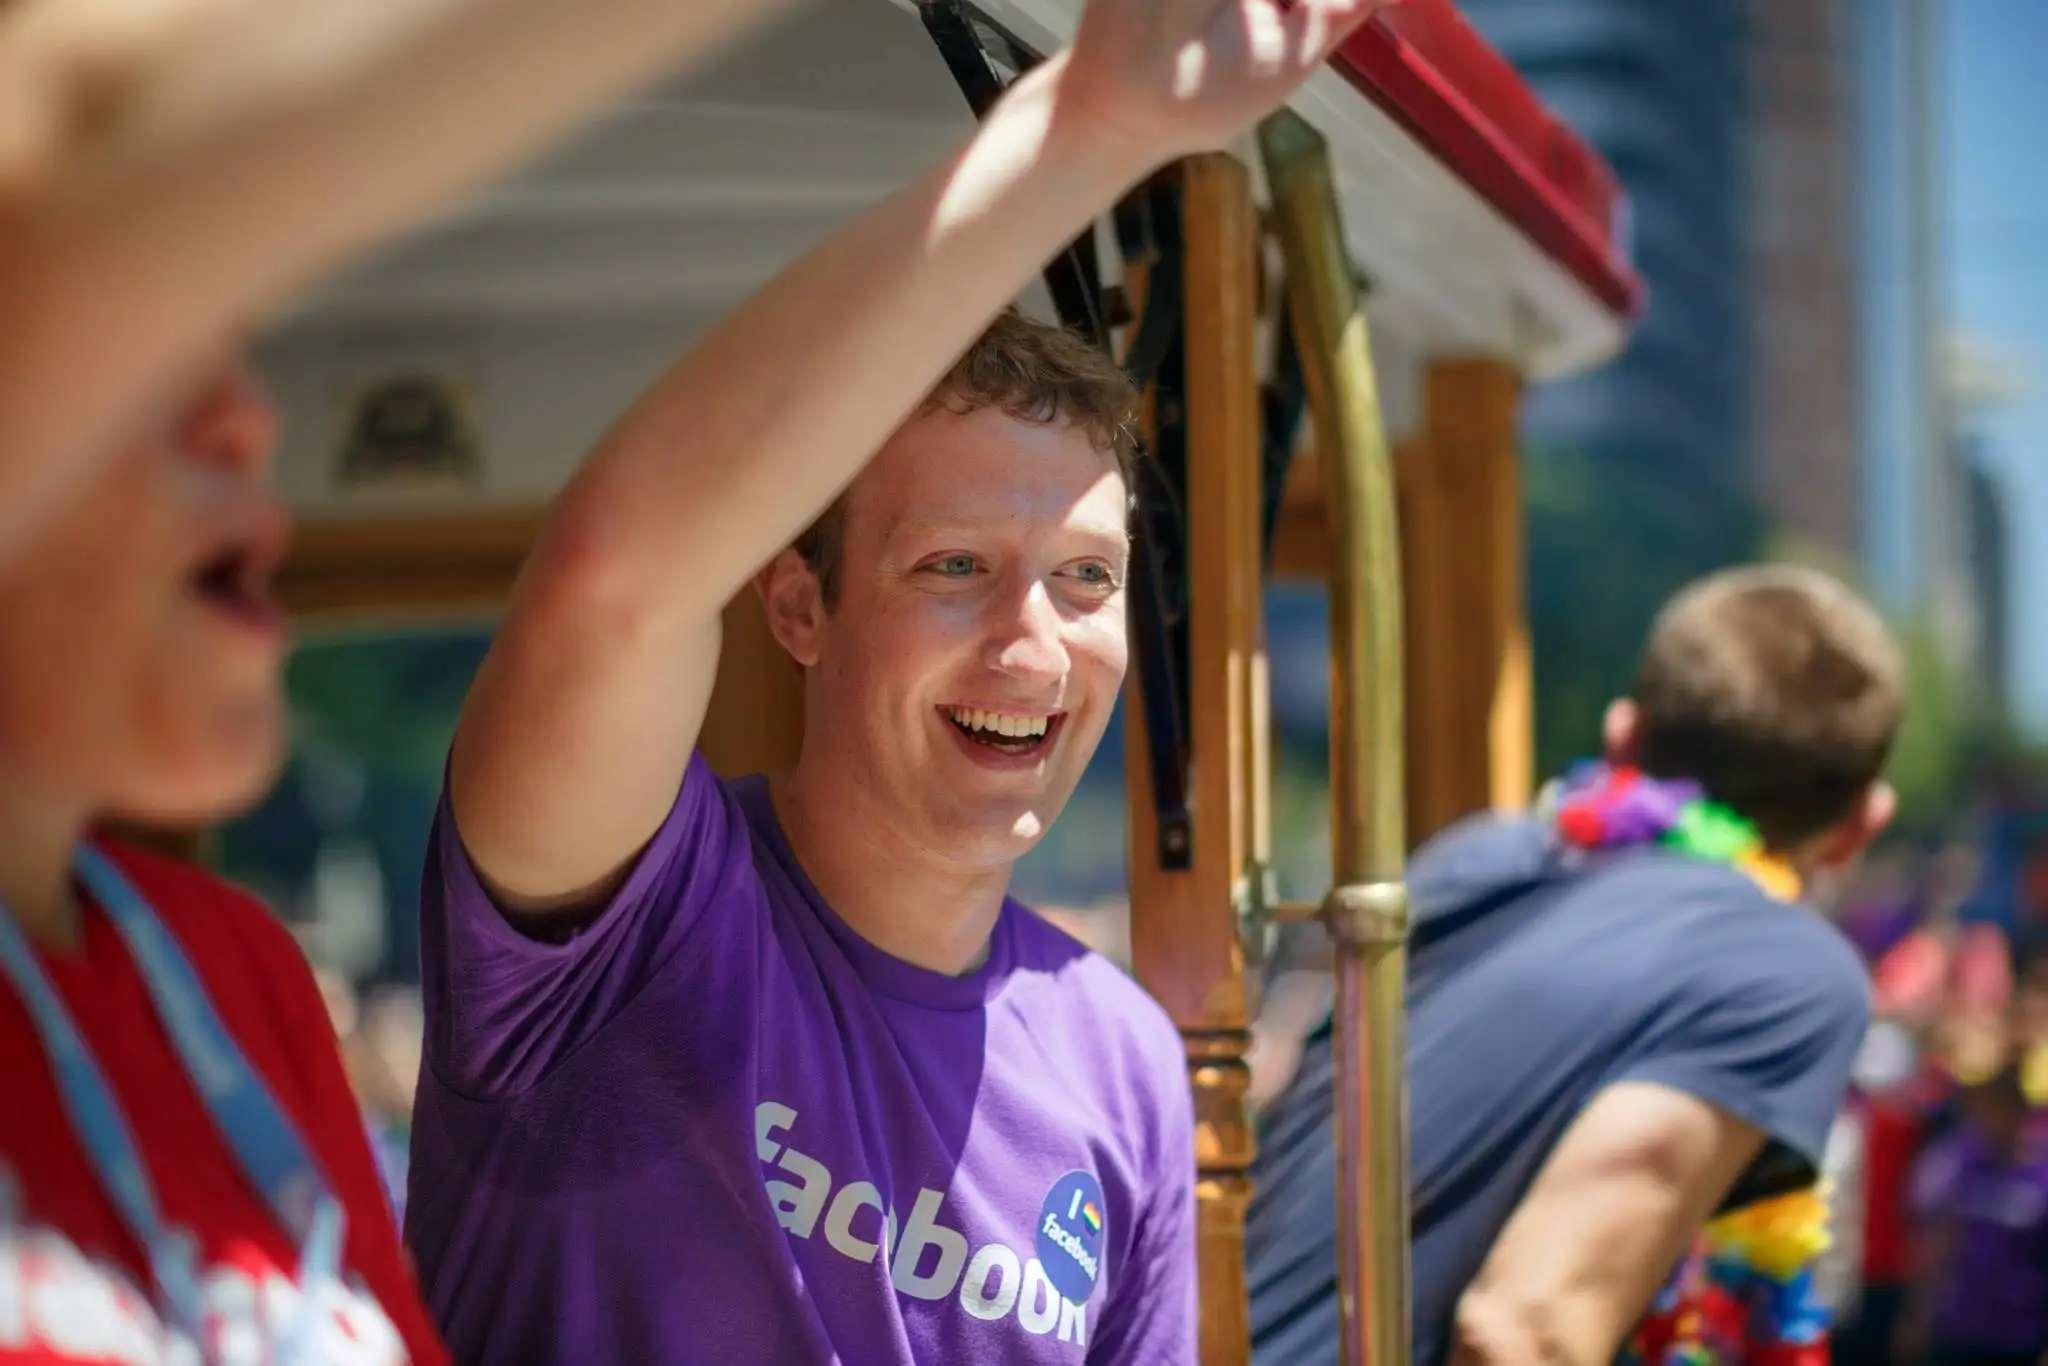 Facebook founder Mark Zuckerberg gave $100 million in 2010 to improve public schools in Newark, N.J.